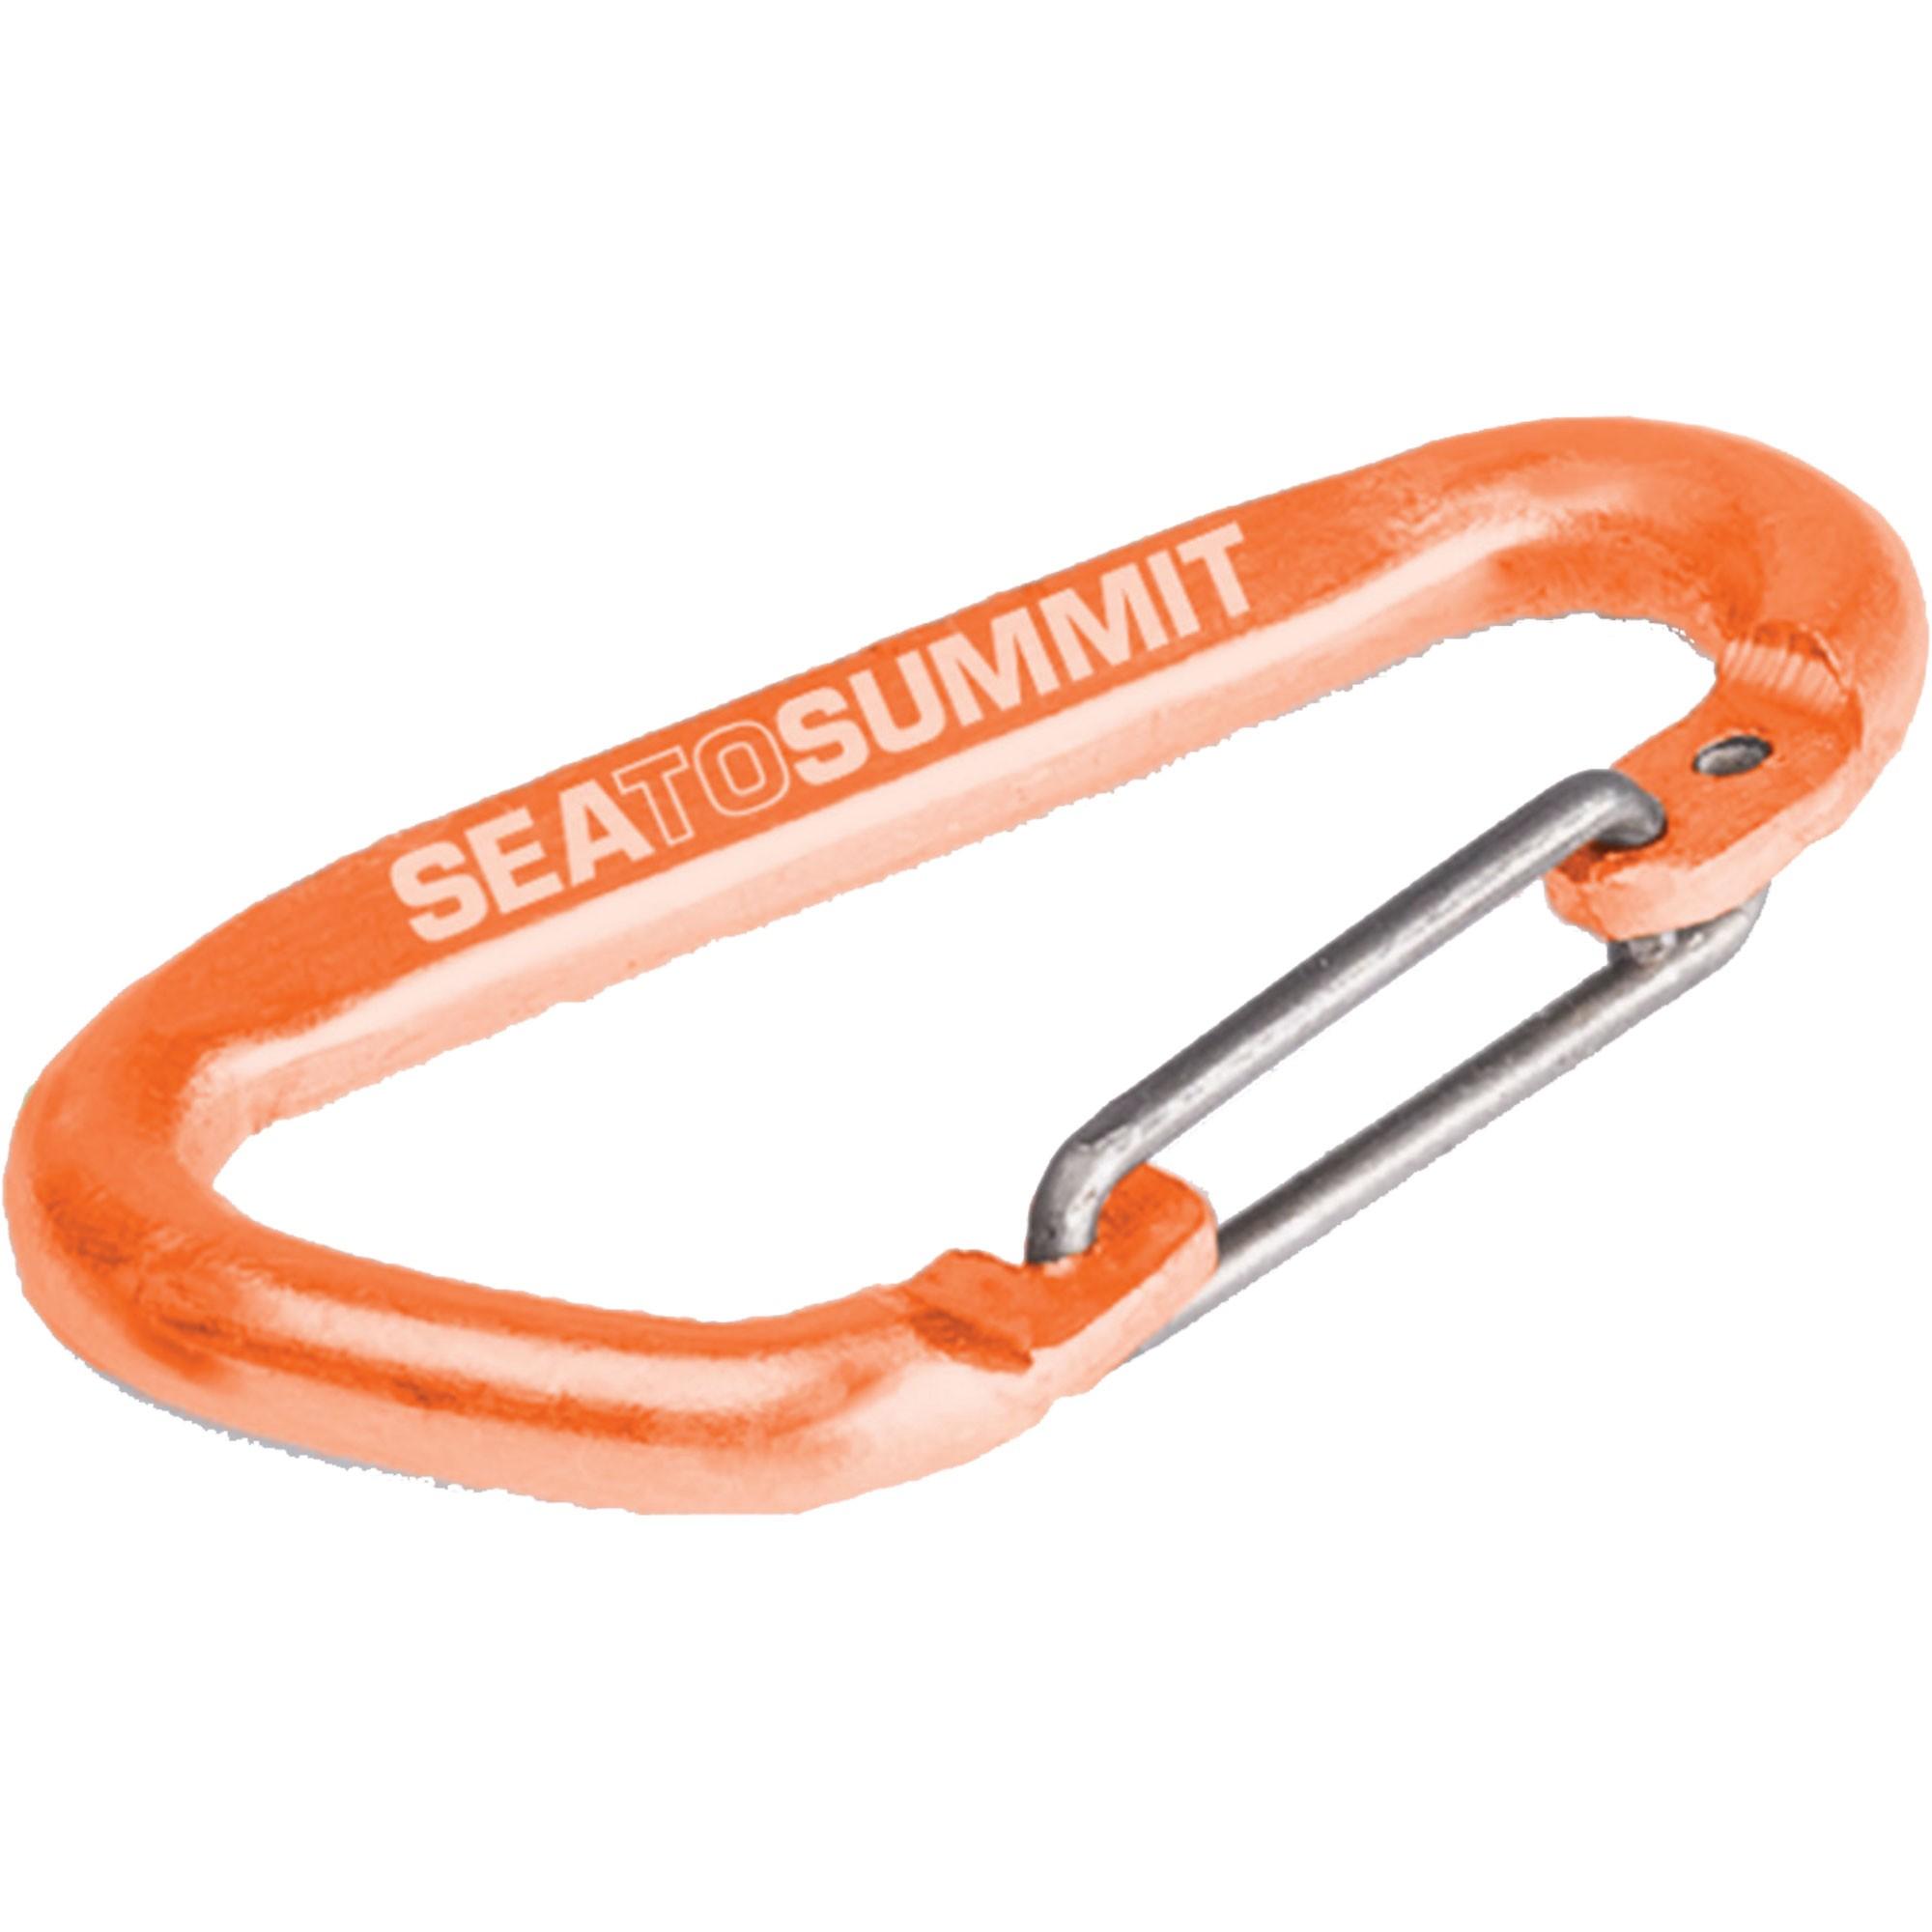 Sea to Summit Accessory Carabiner Set 3pcs